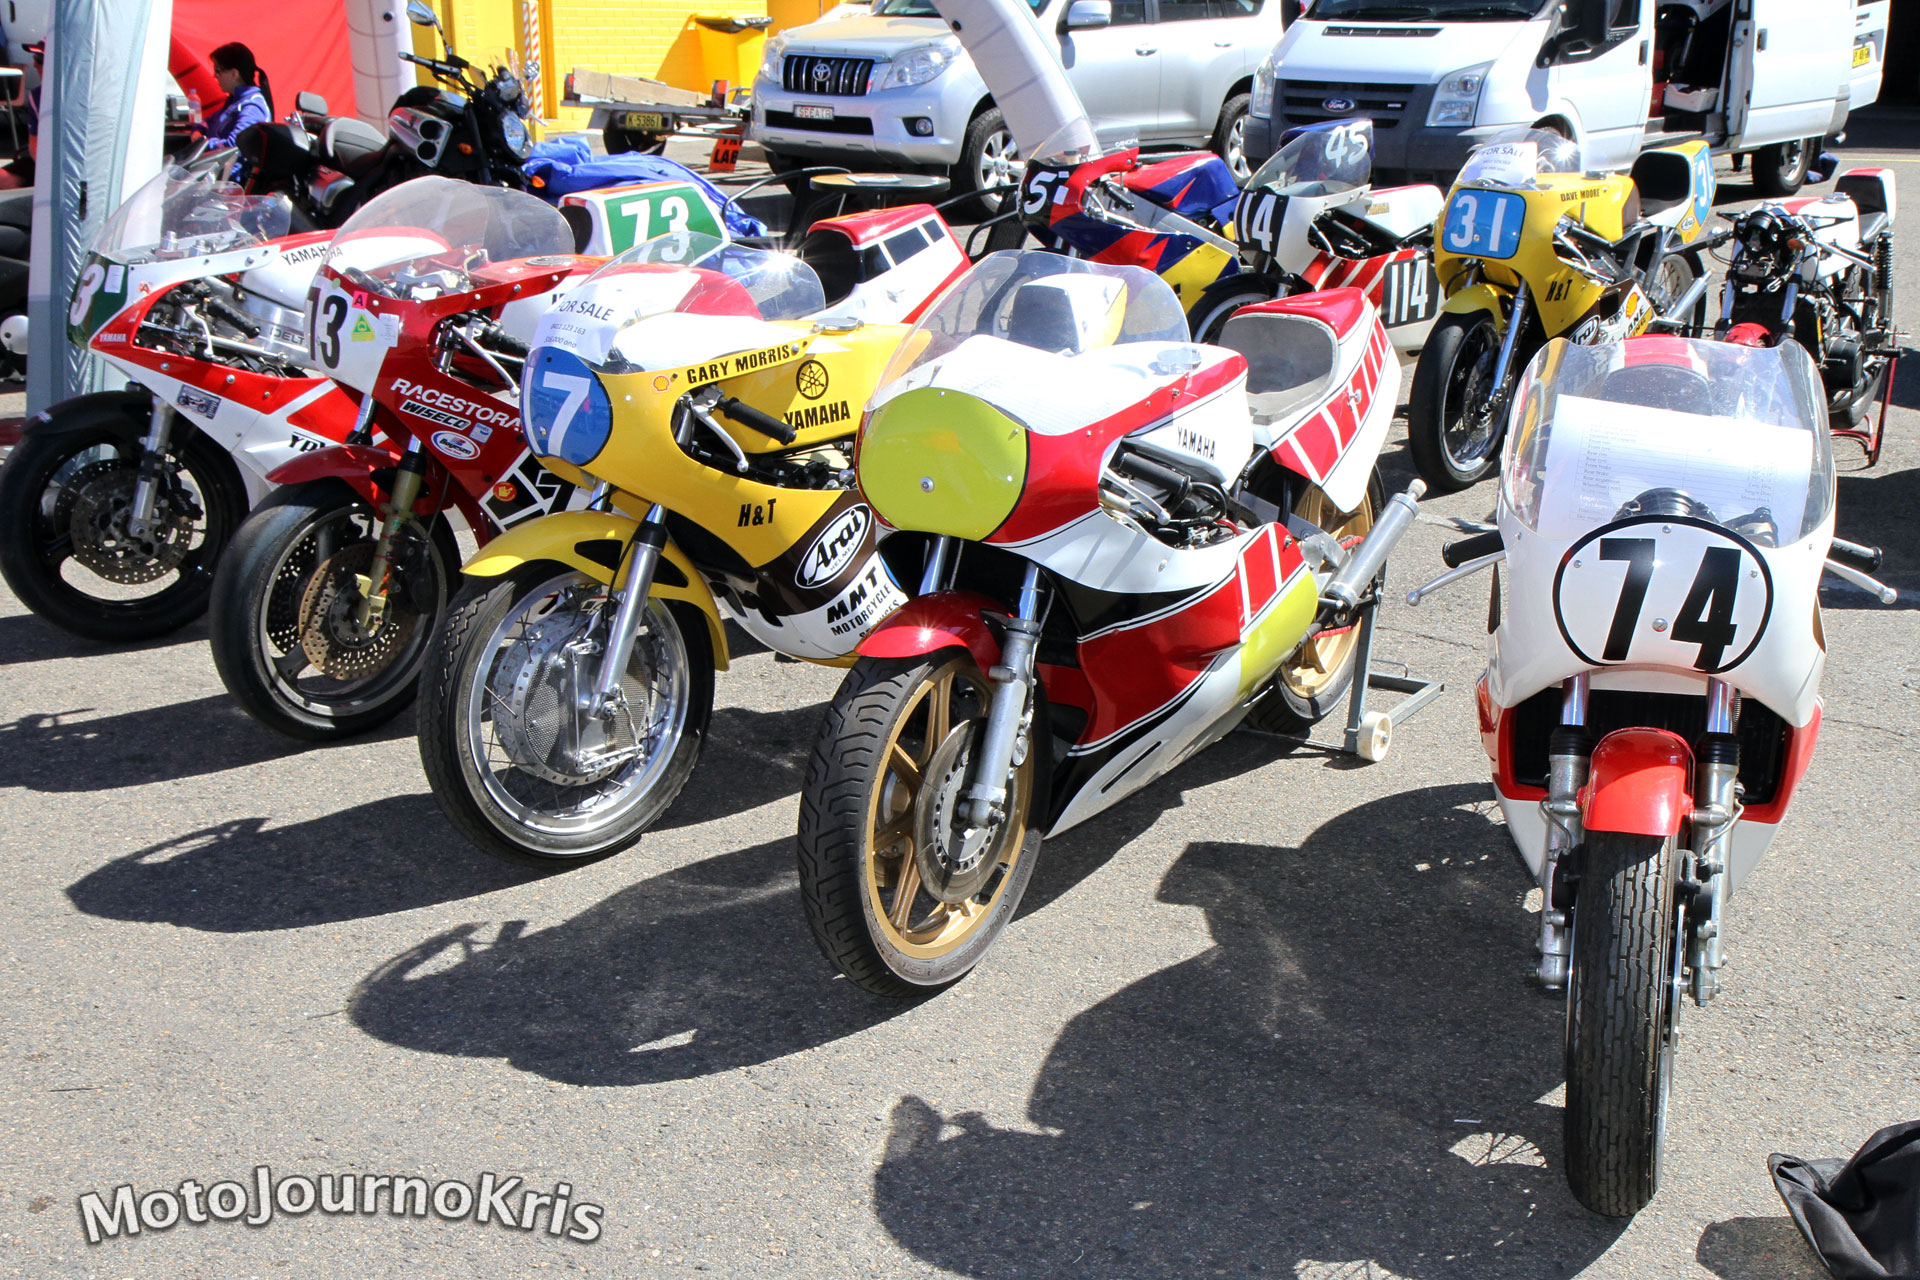 Barry Sheene Festival of Speed 2013